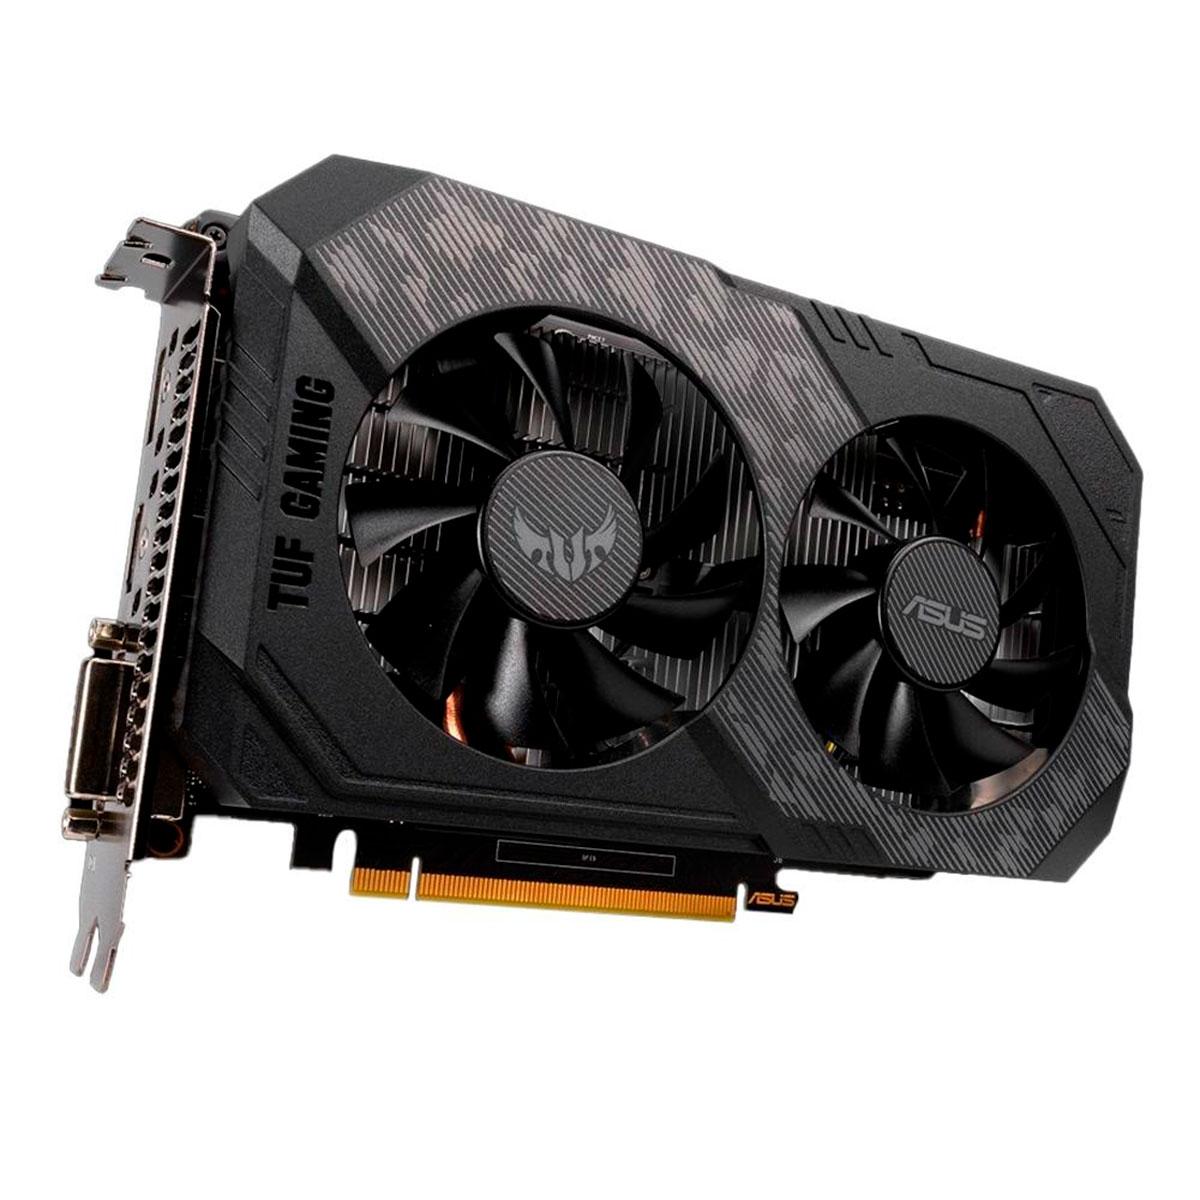 Placa de Vídeo Asus GeForce GTX 1650 TUF Gaming OC, 4GB GDDR6, 128 Bits - TUF-GTX1650-O4GD6-P-GAMING